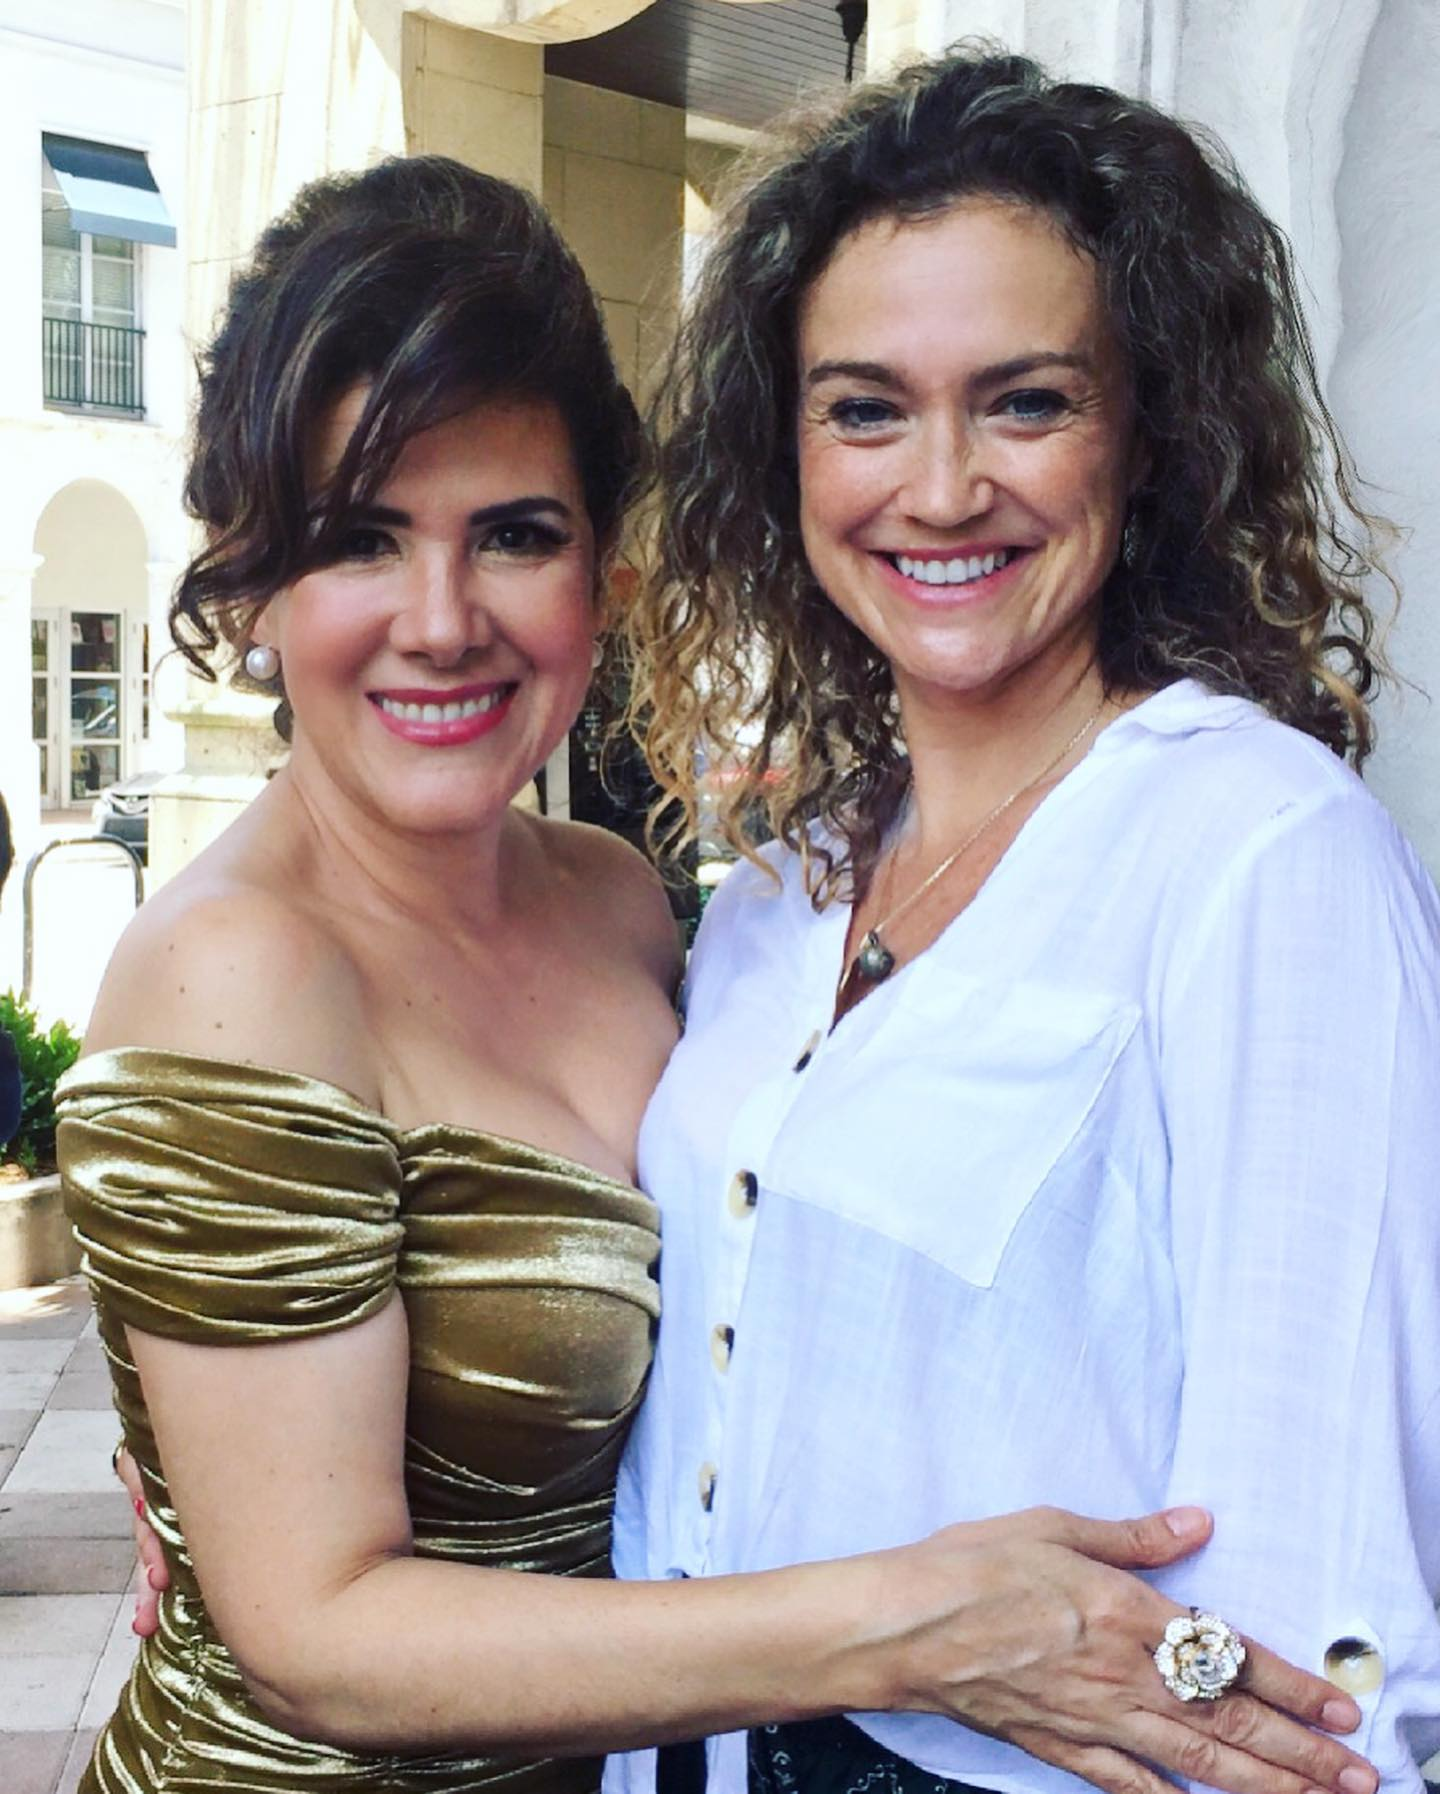 Rosalinda y Angela.jpg